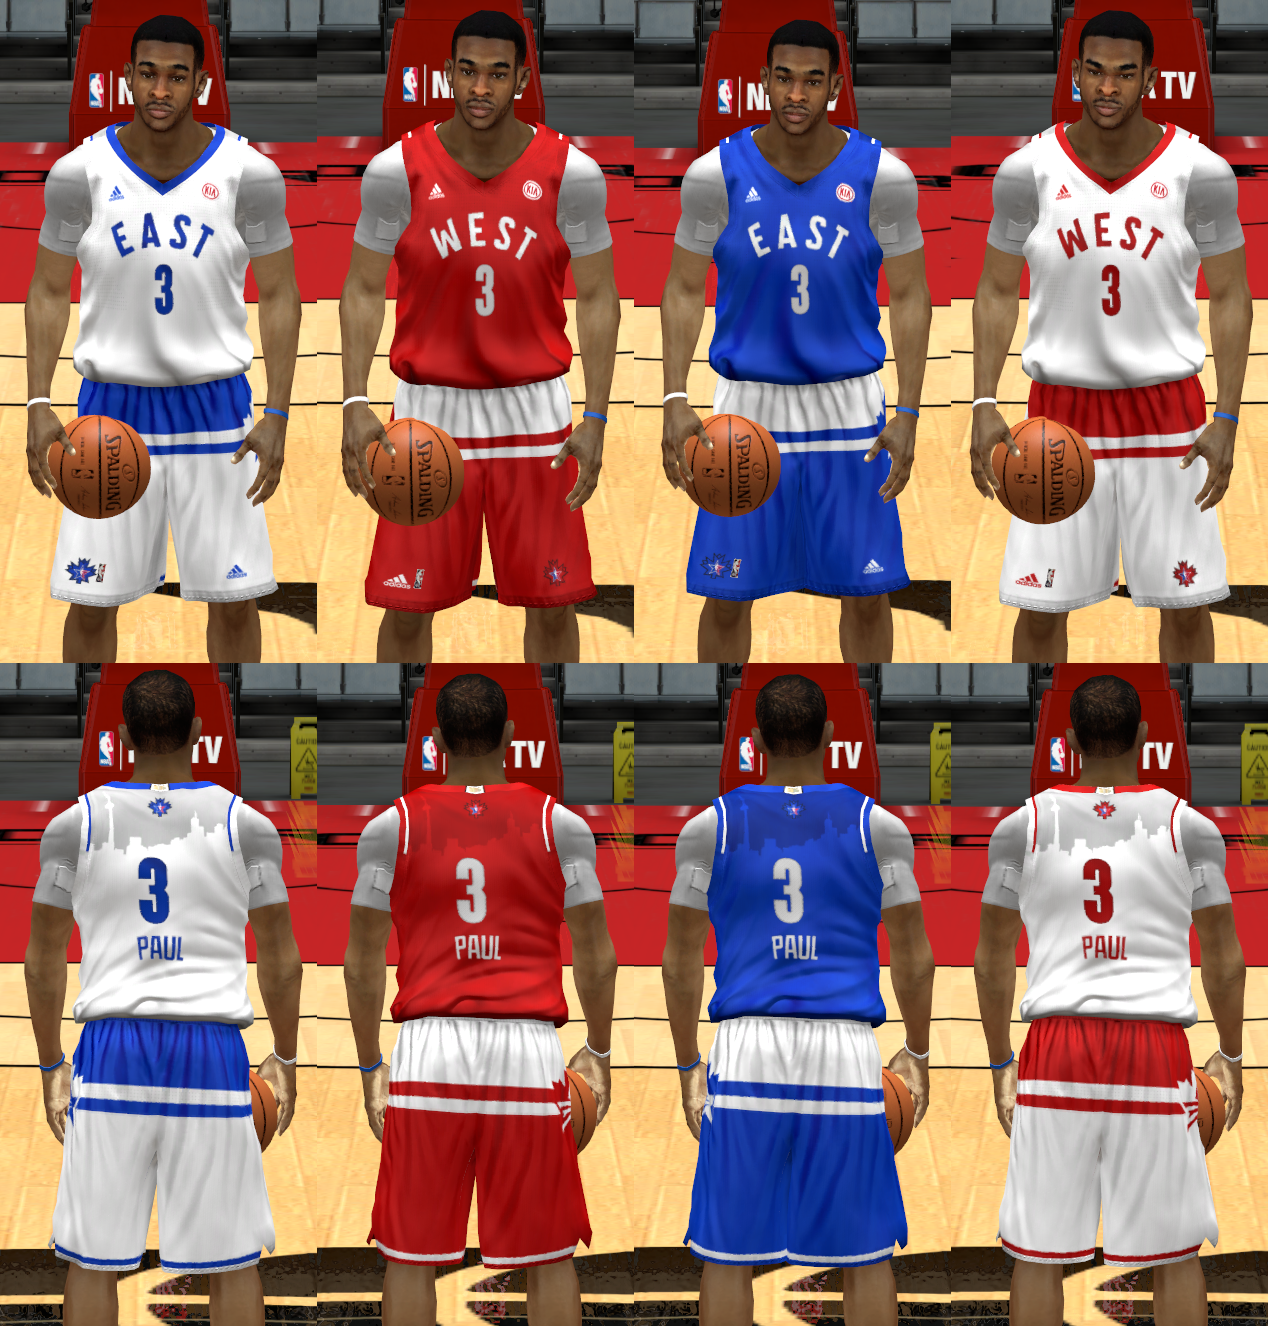 a08d2409bef2 NLSC Forum • Downloads - 2016 All-Star Game Uniforms